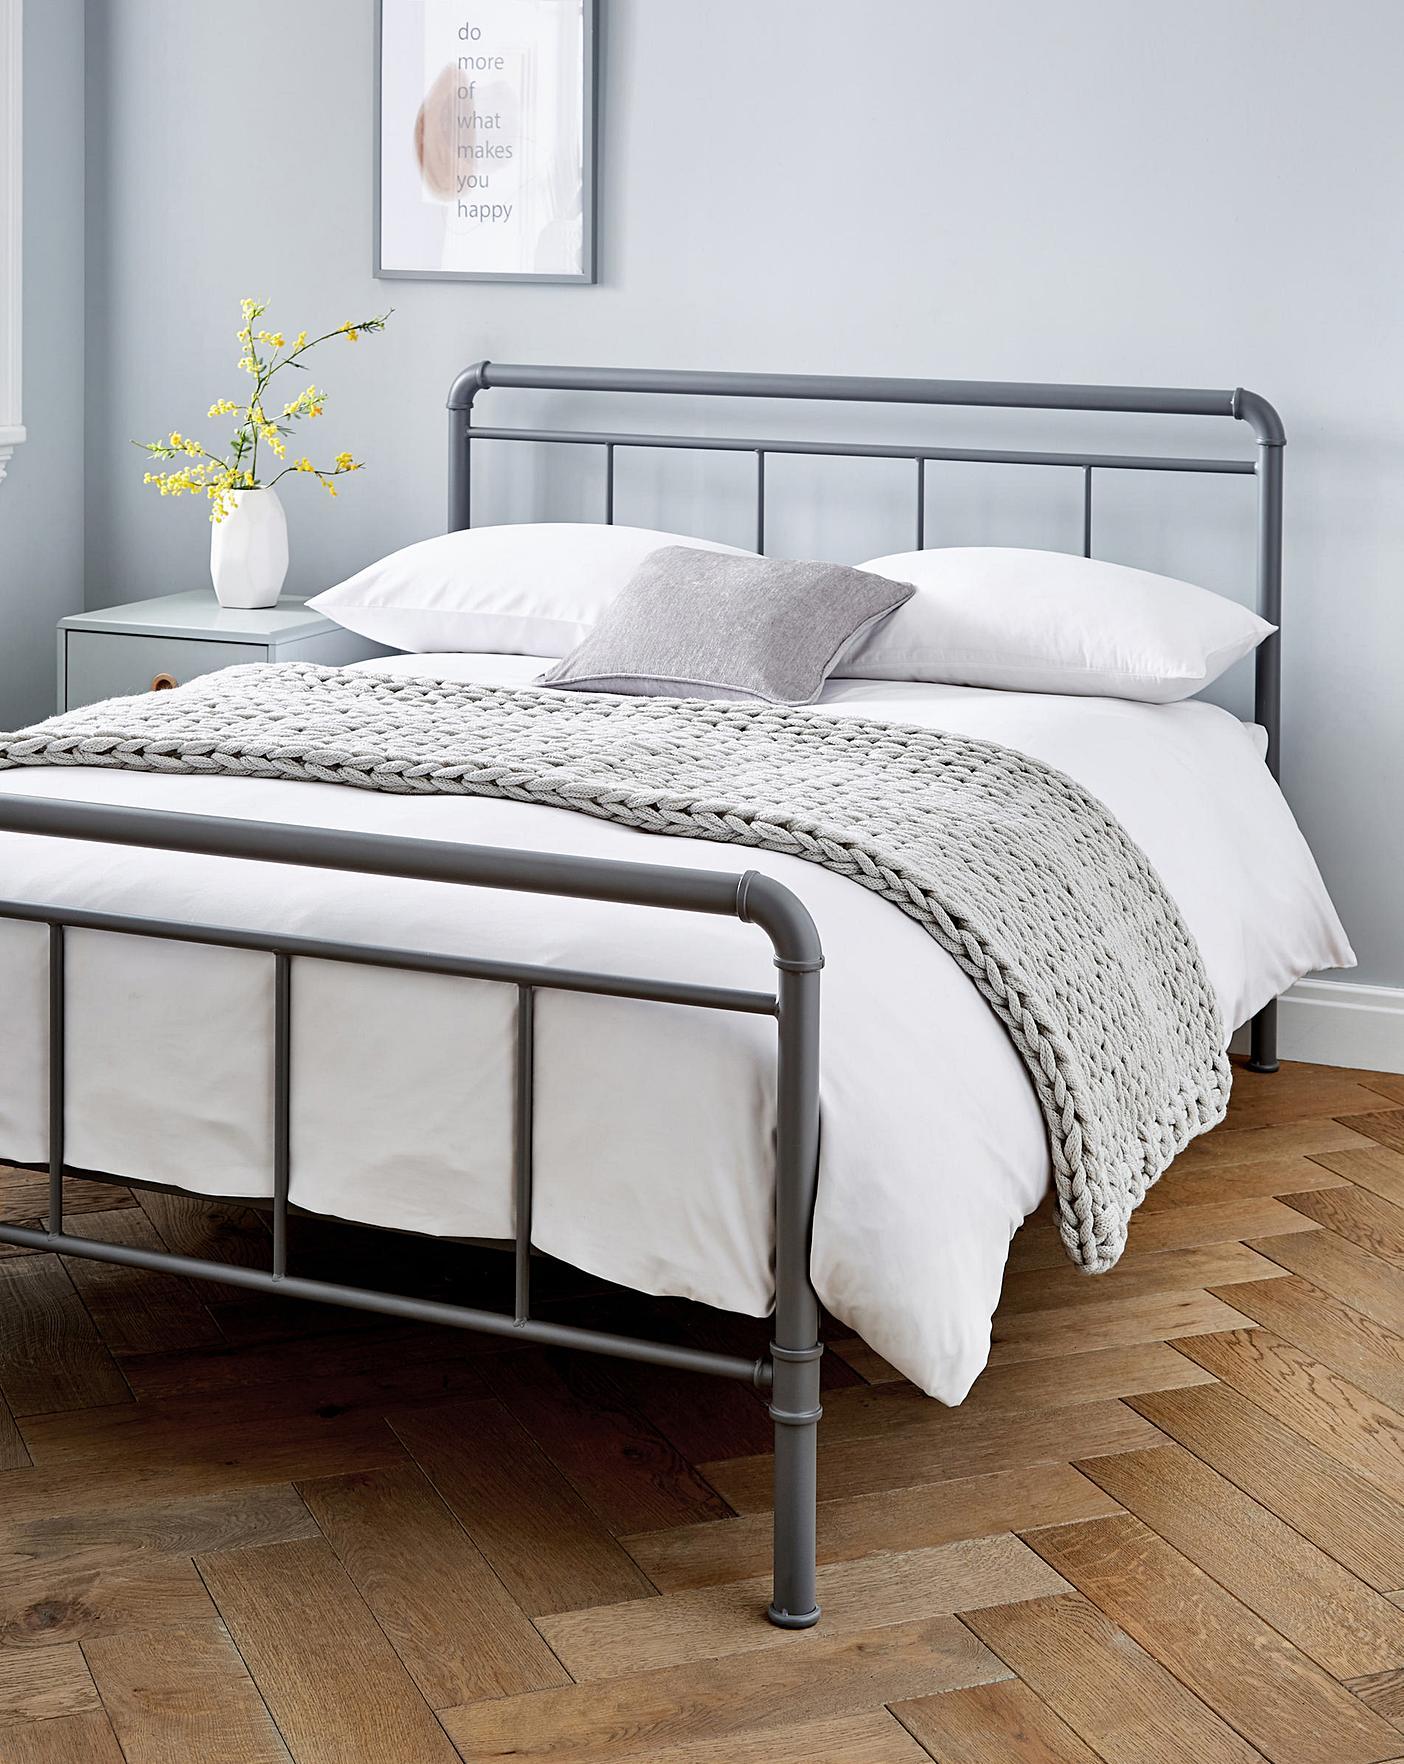 Bowen Industrial Metal Bed Frame Oxendales